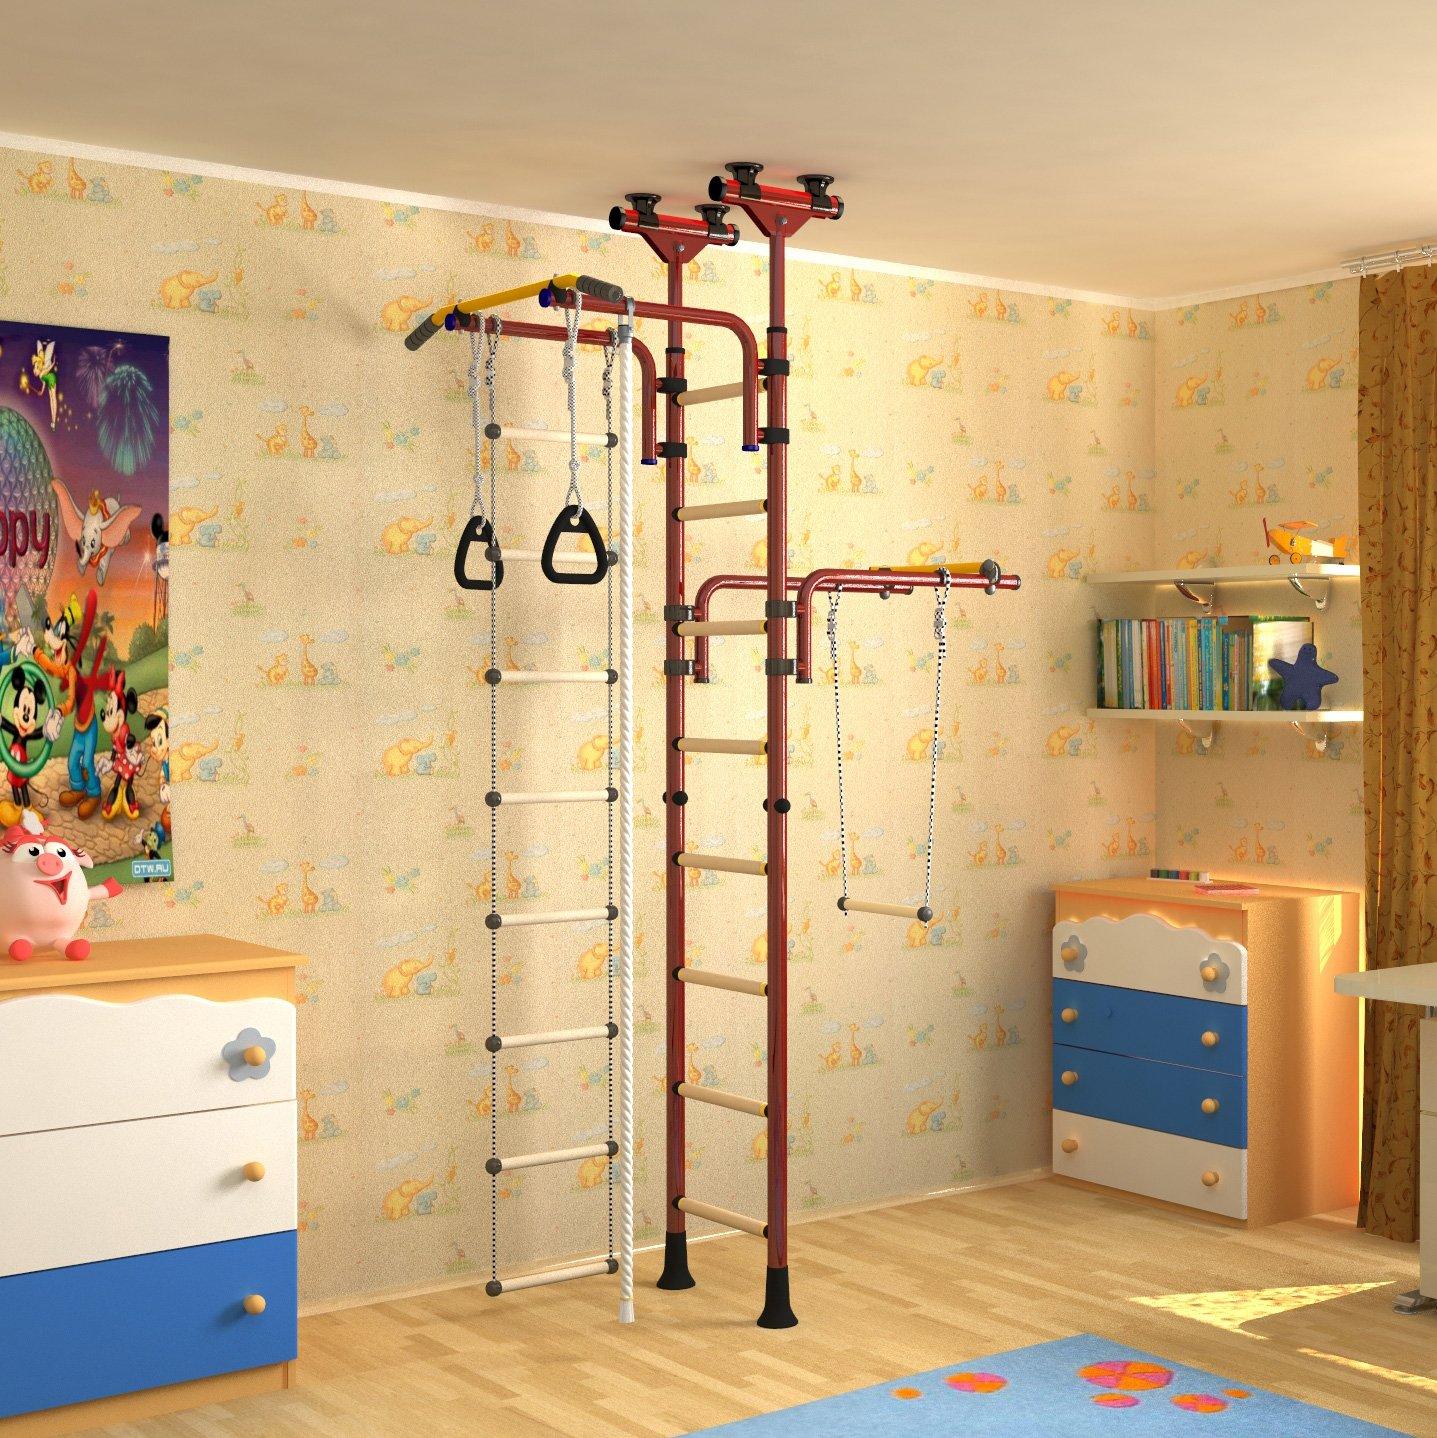 Indoor Klettergerüst für Kinder Sprossenwand Kinderturngerät ...